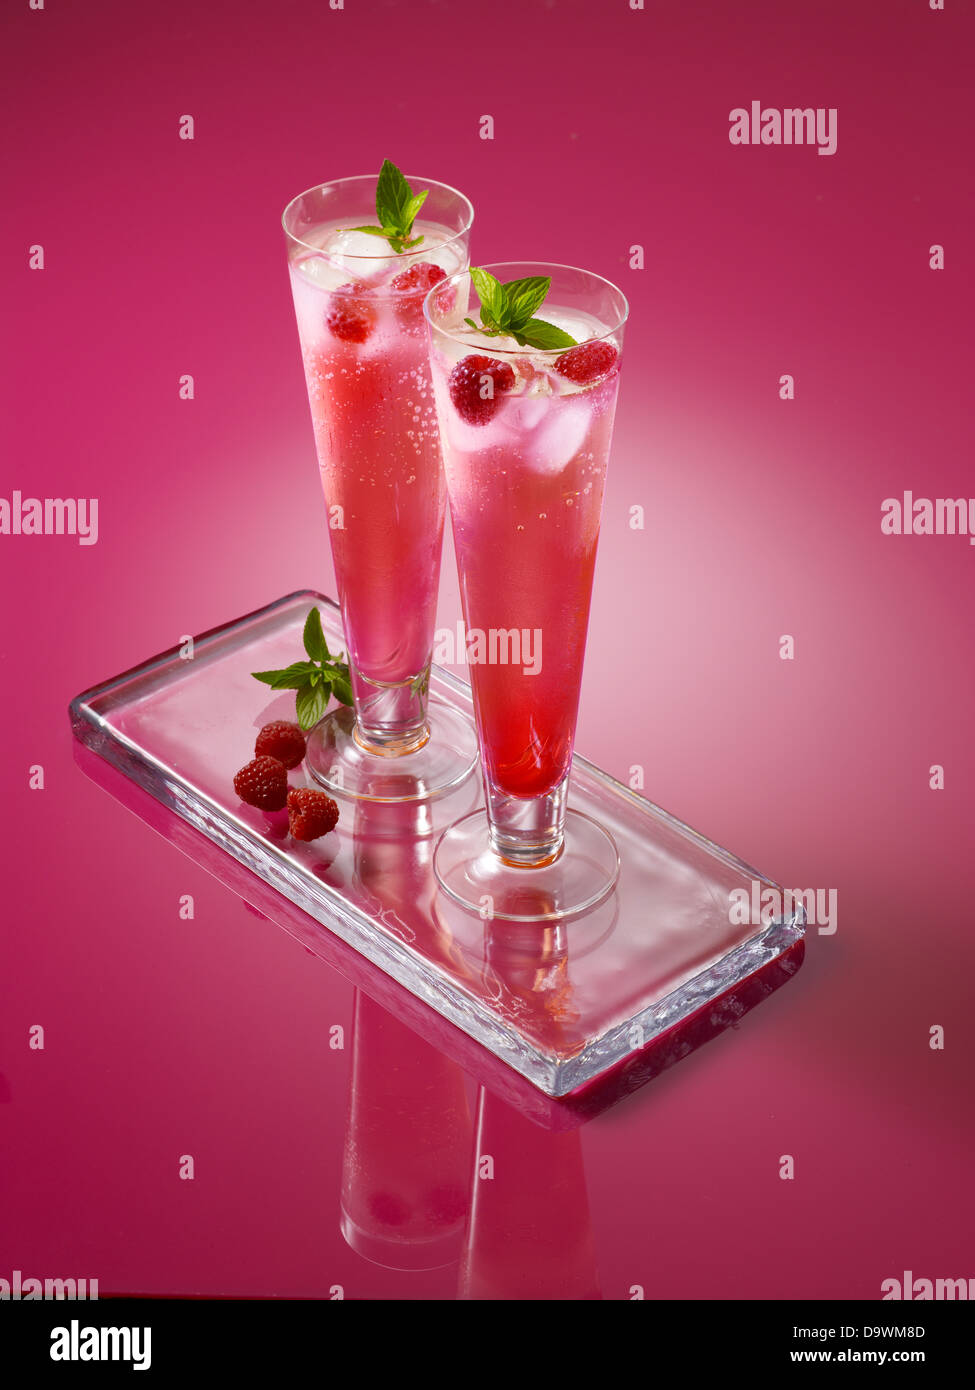 Pink drinks - Stock Image